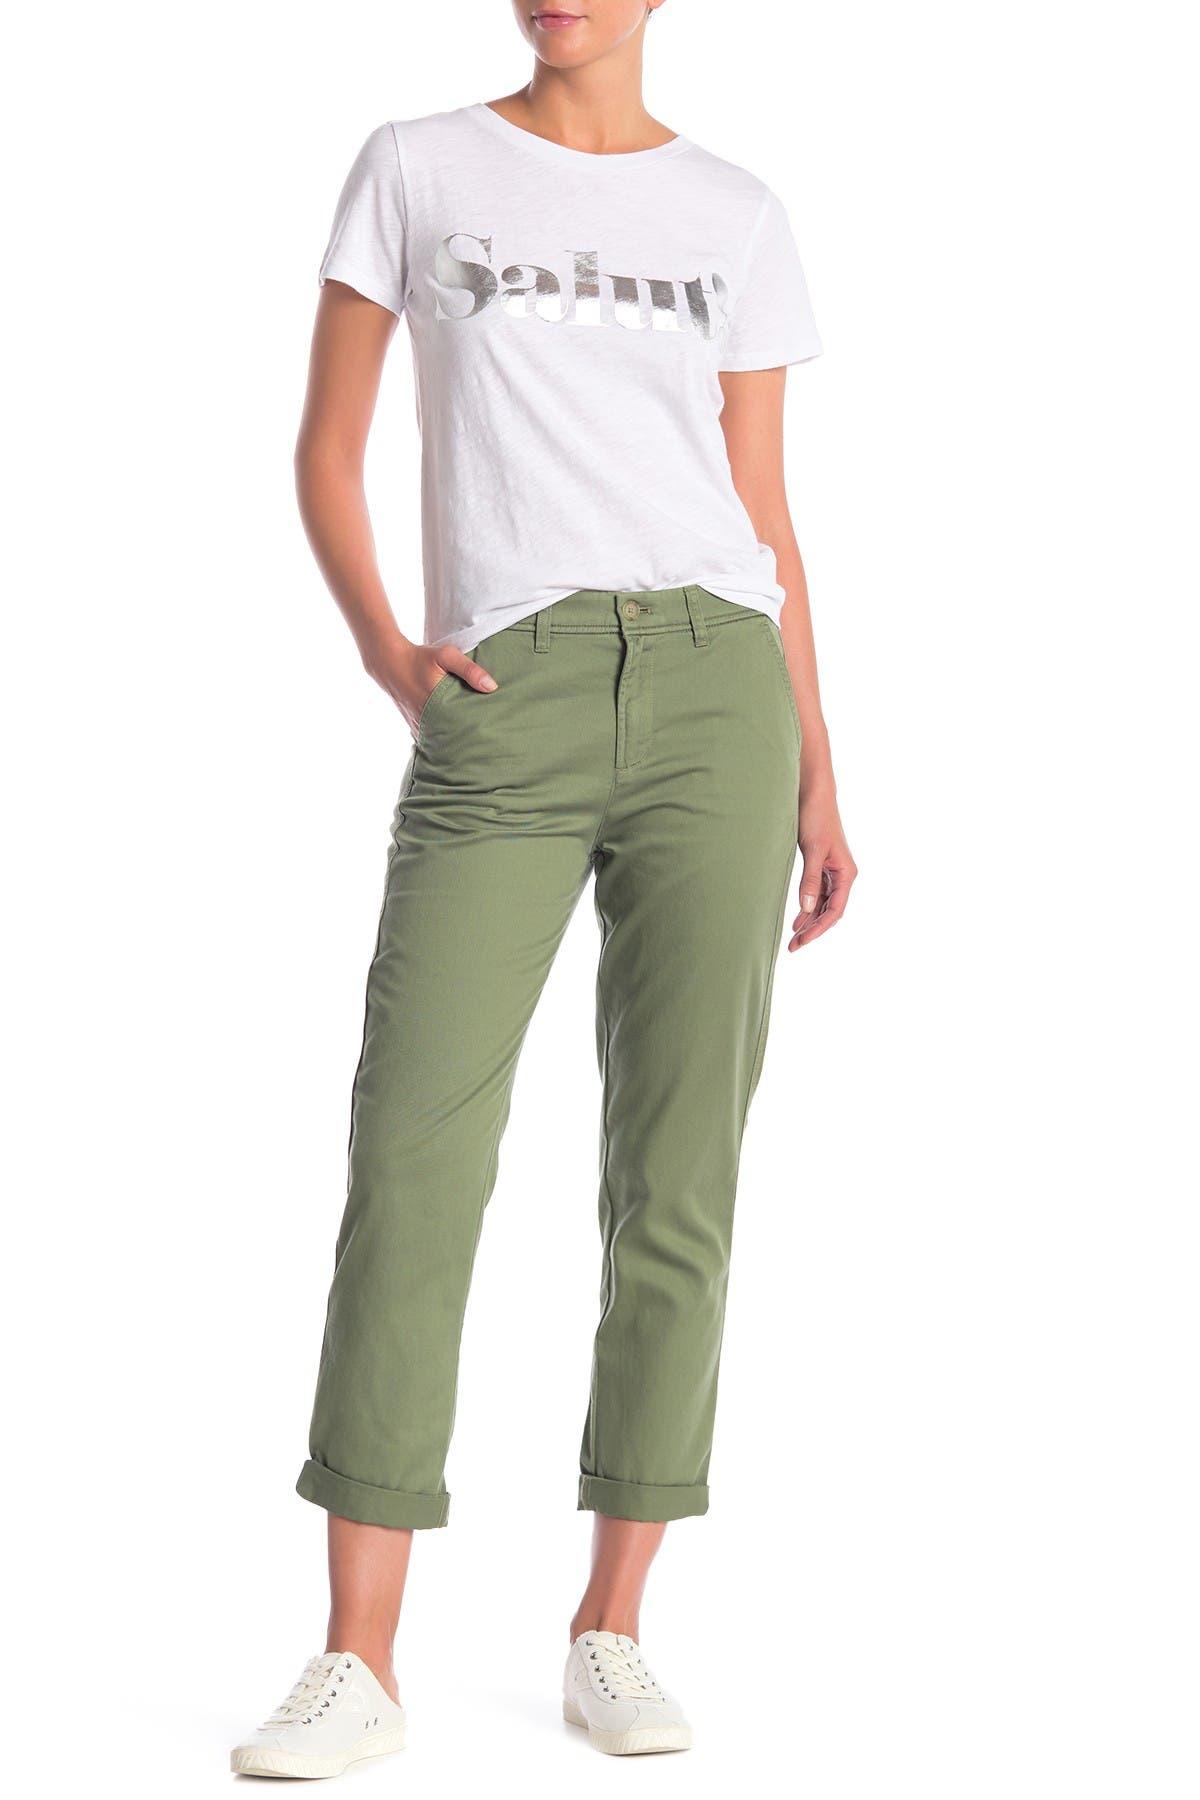 Image of J. Crew Slim Chino Pants